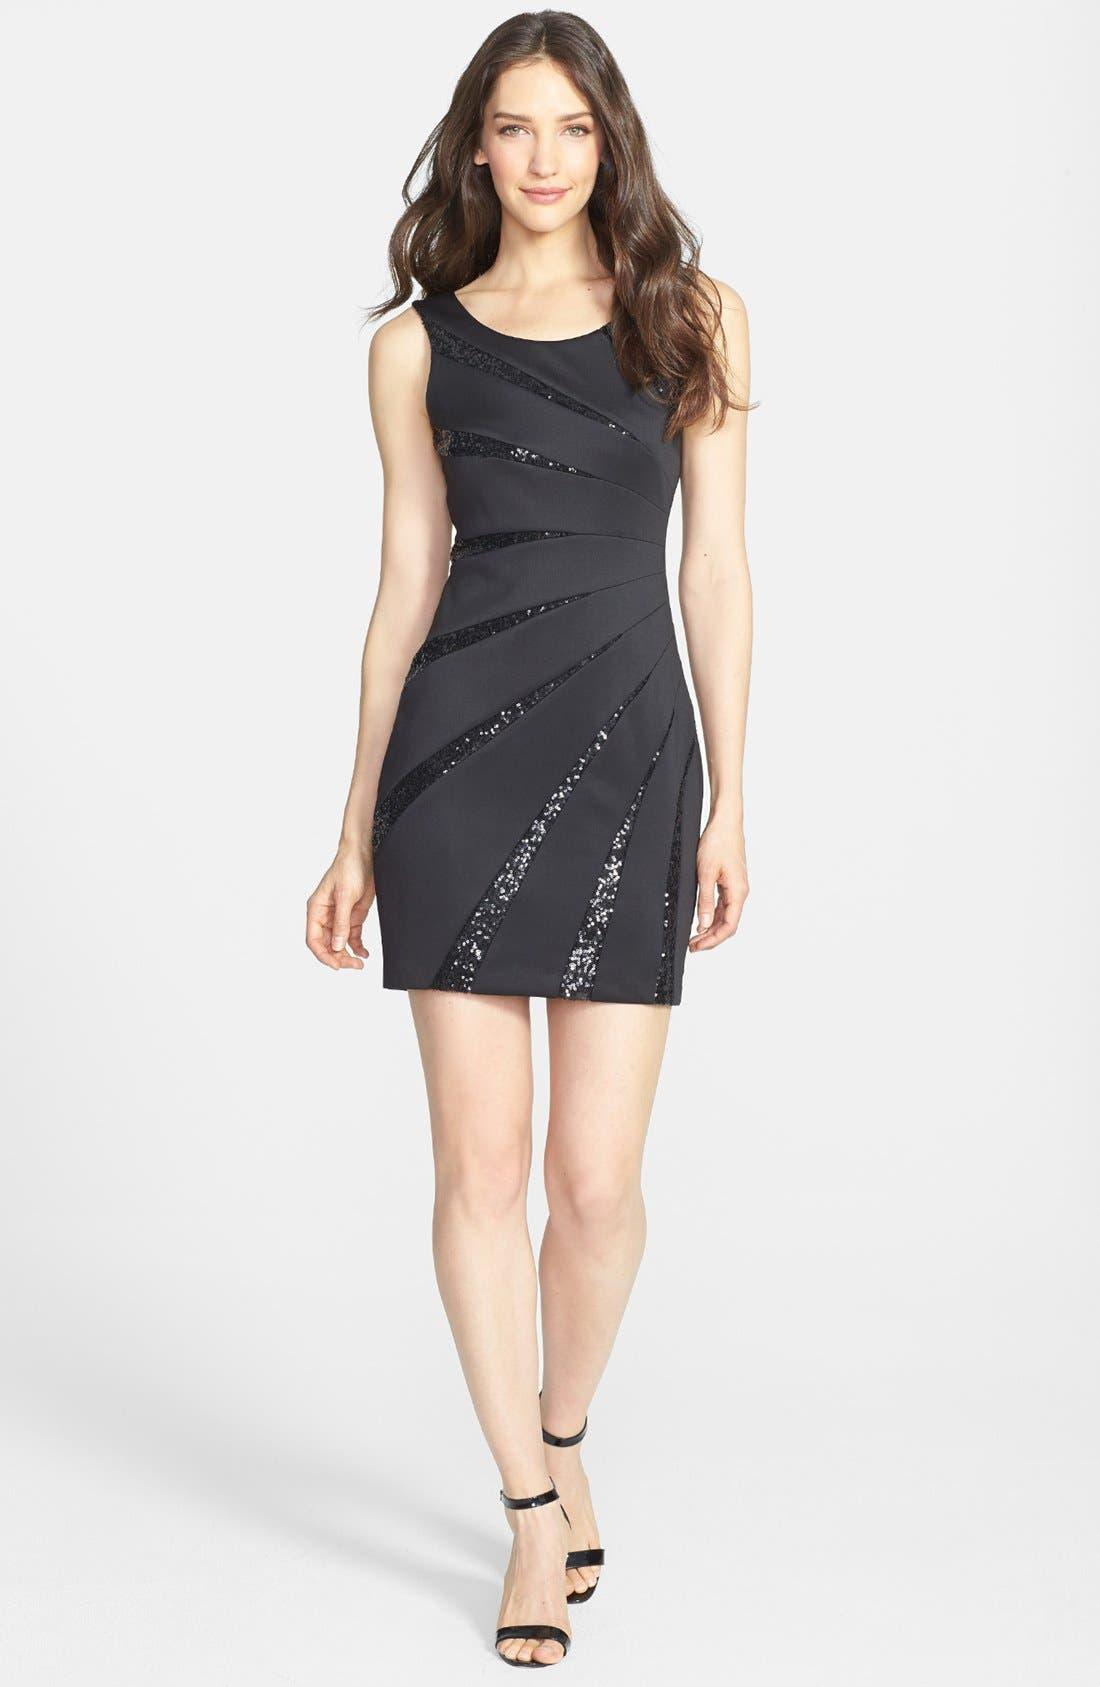 Alternate Image 1 Selected - GUESS Sequin Embellished Scuba Sheath Dress